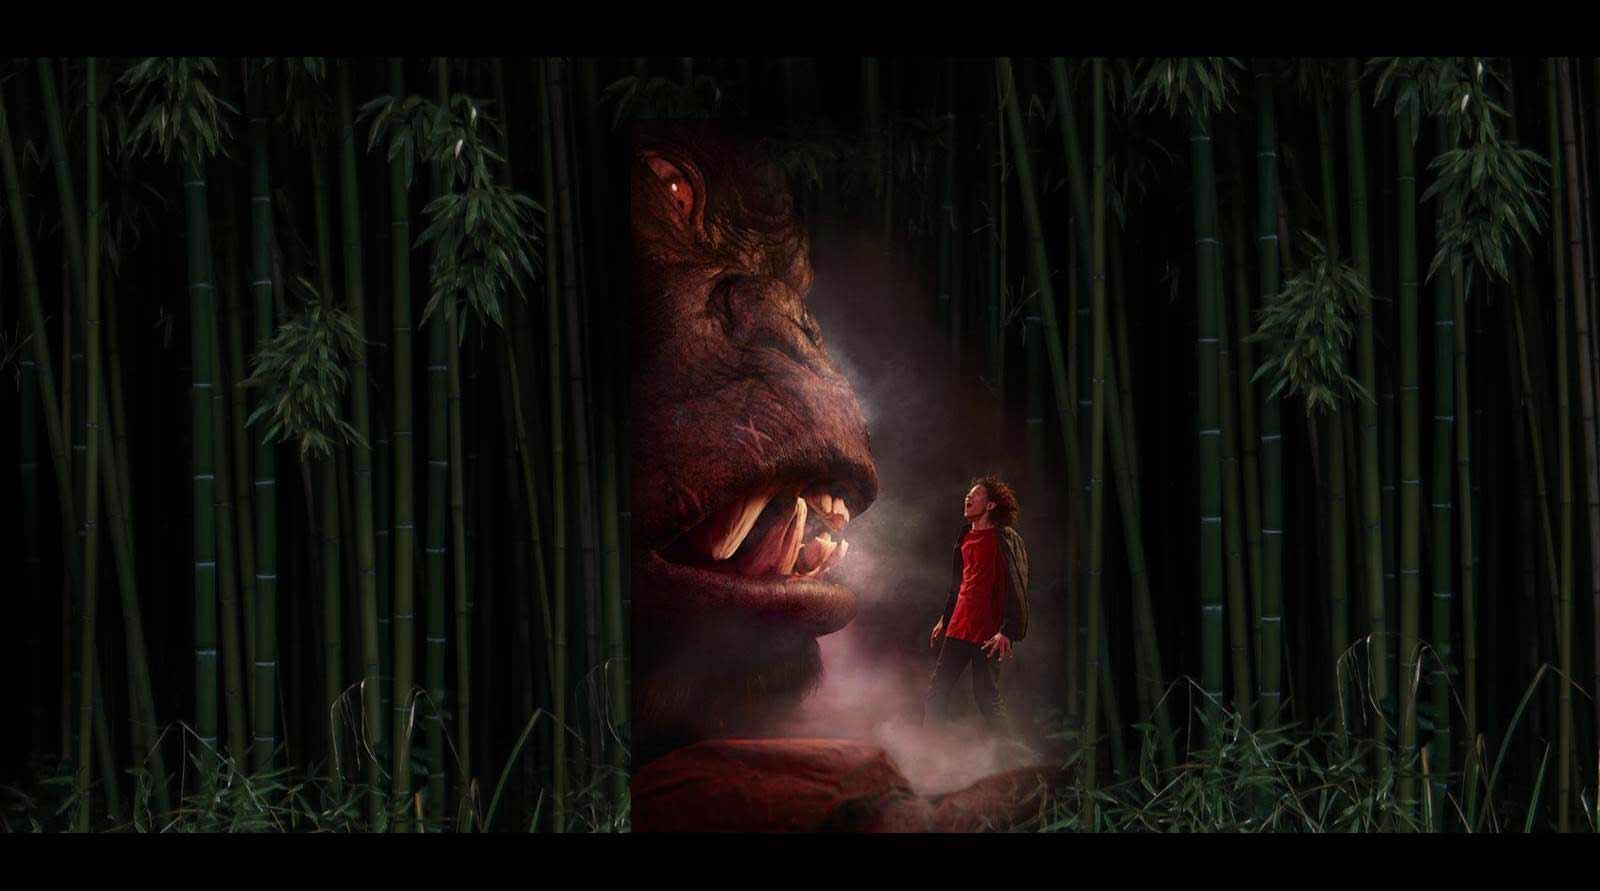 Kong Skull Islands Madame Tussauds